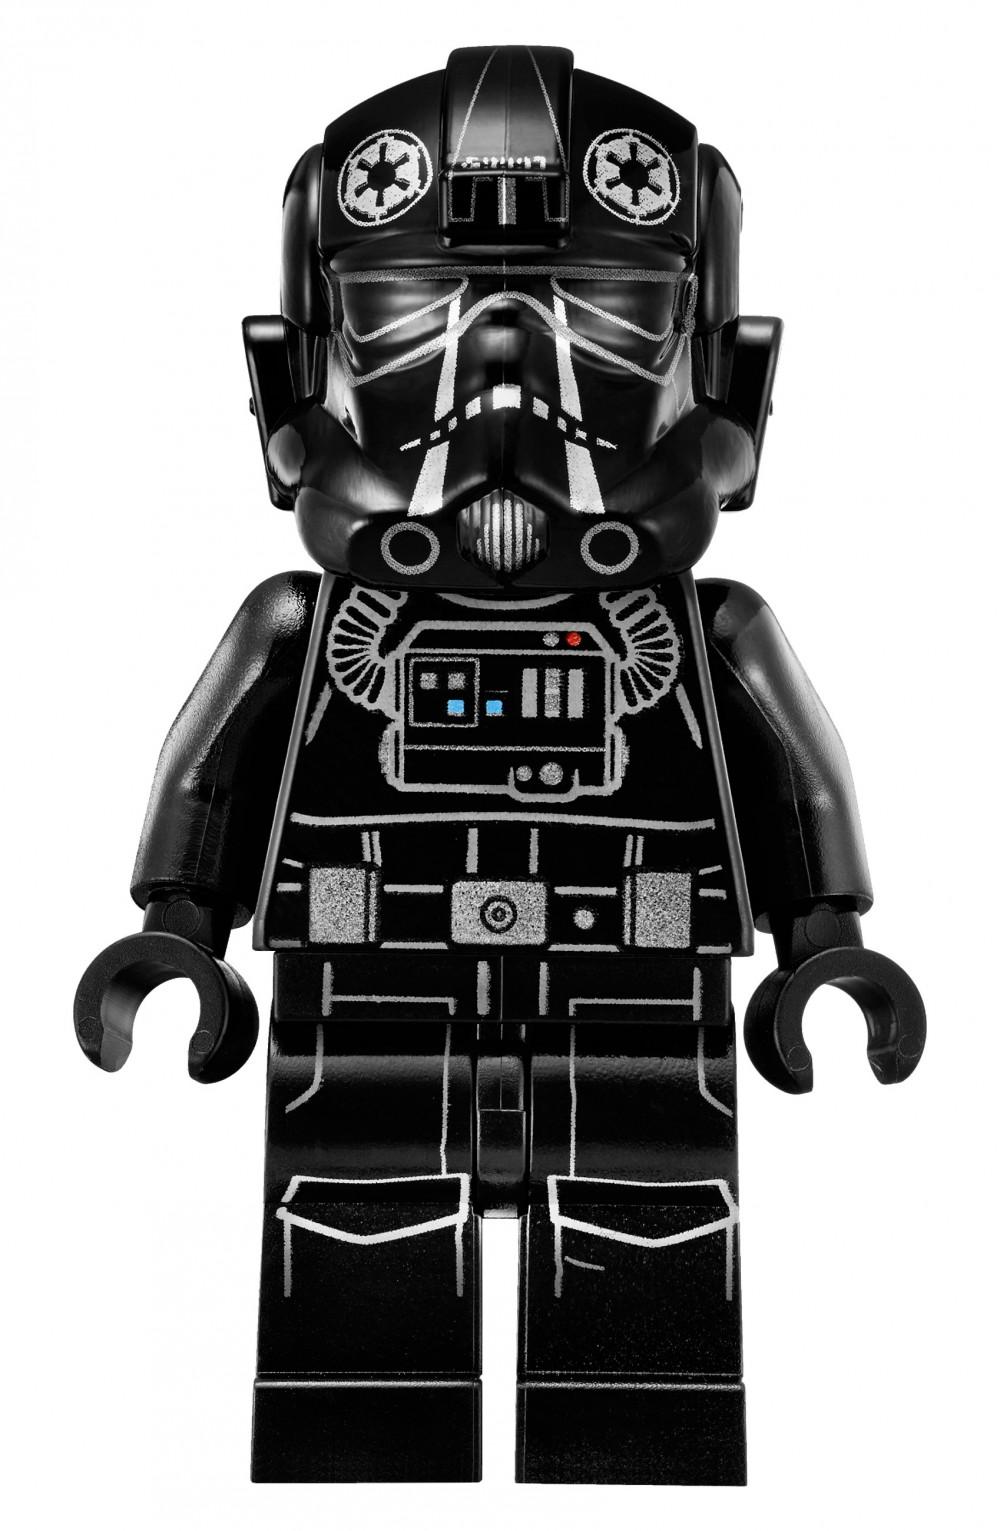 lego star wars pictures lego star wars 75161 pas cher microvaisseau tie striker star lego pictures wars